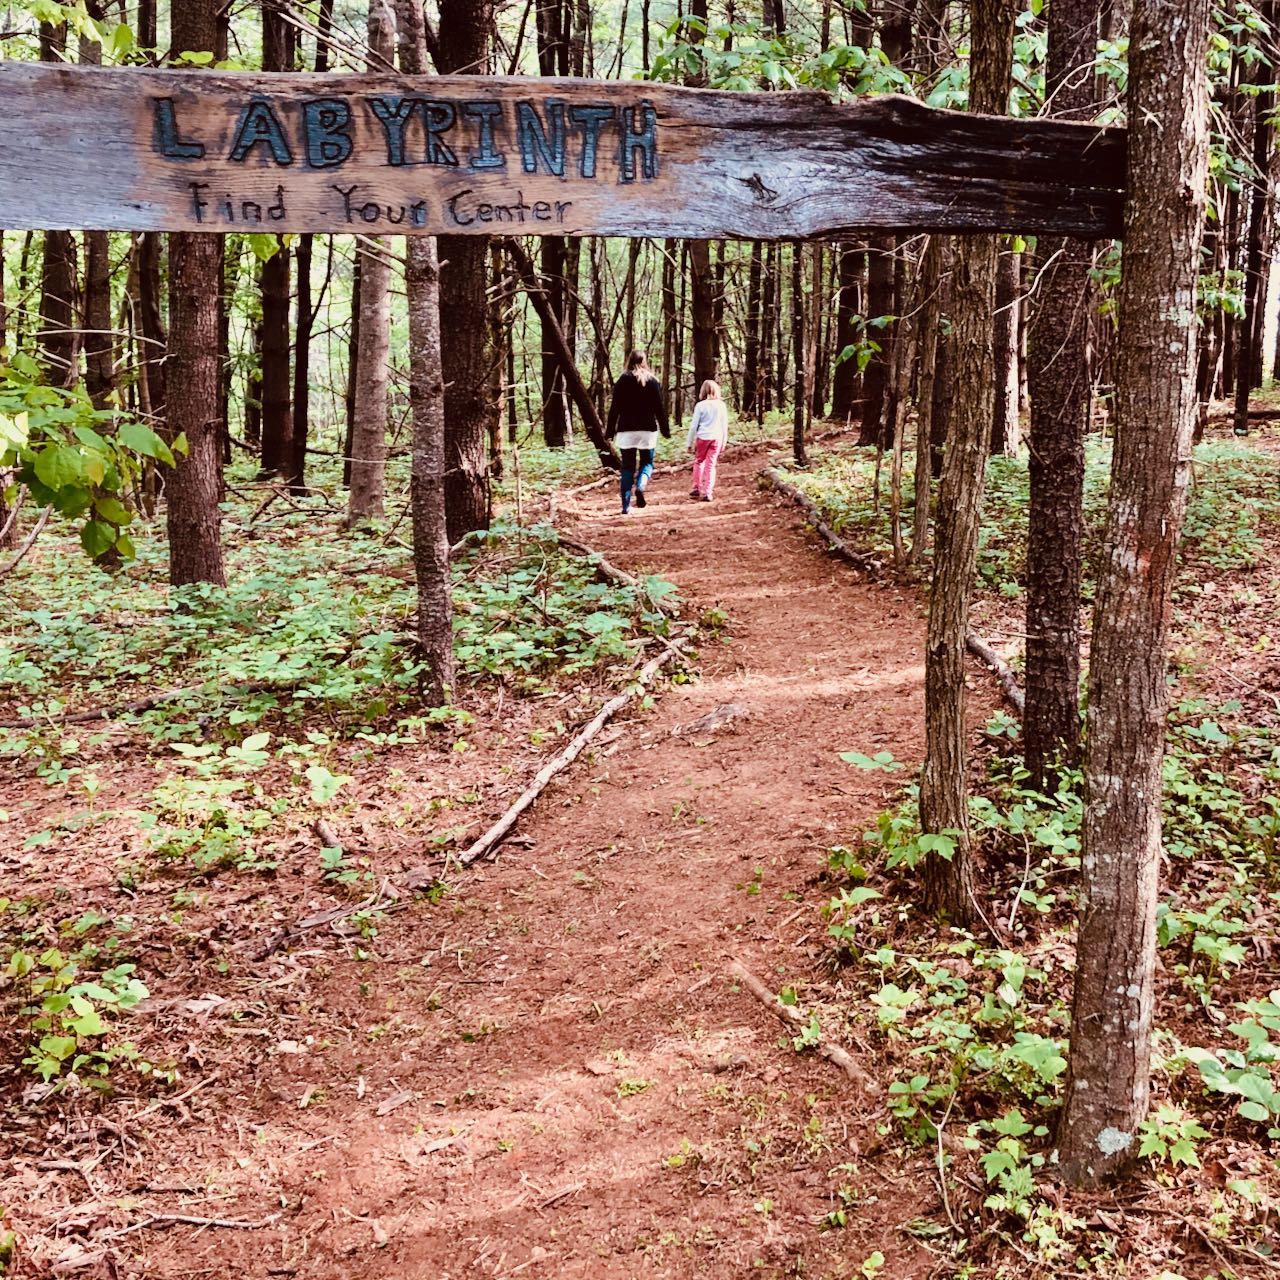 forest labyrinth entrance